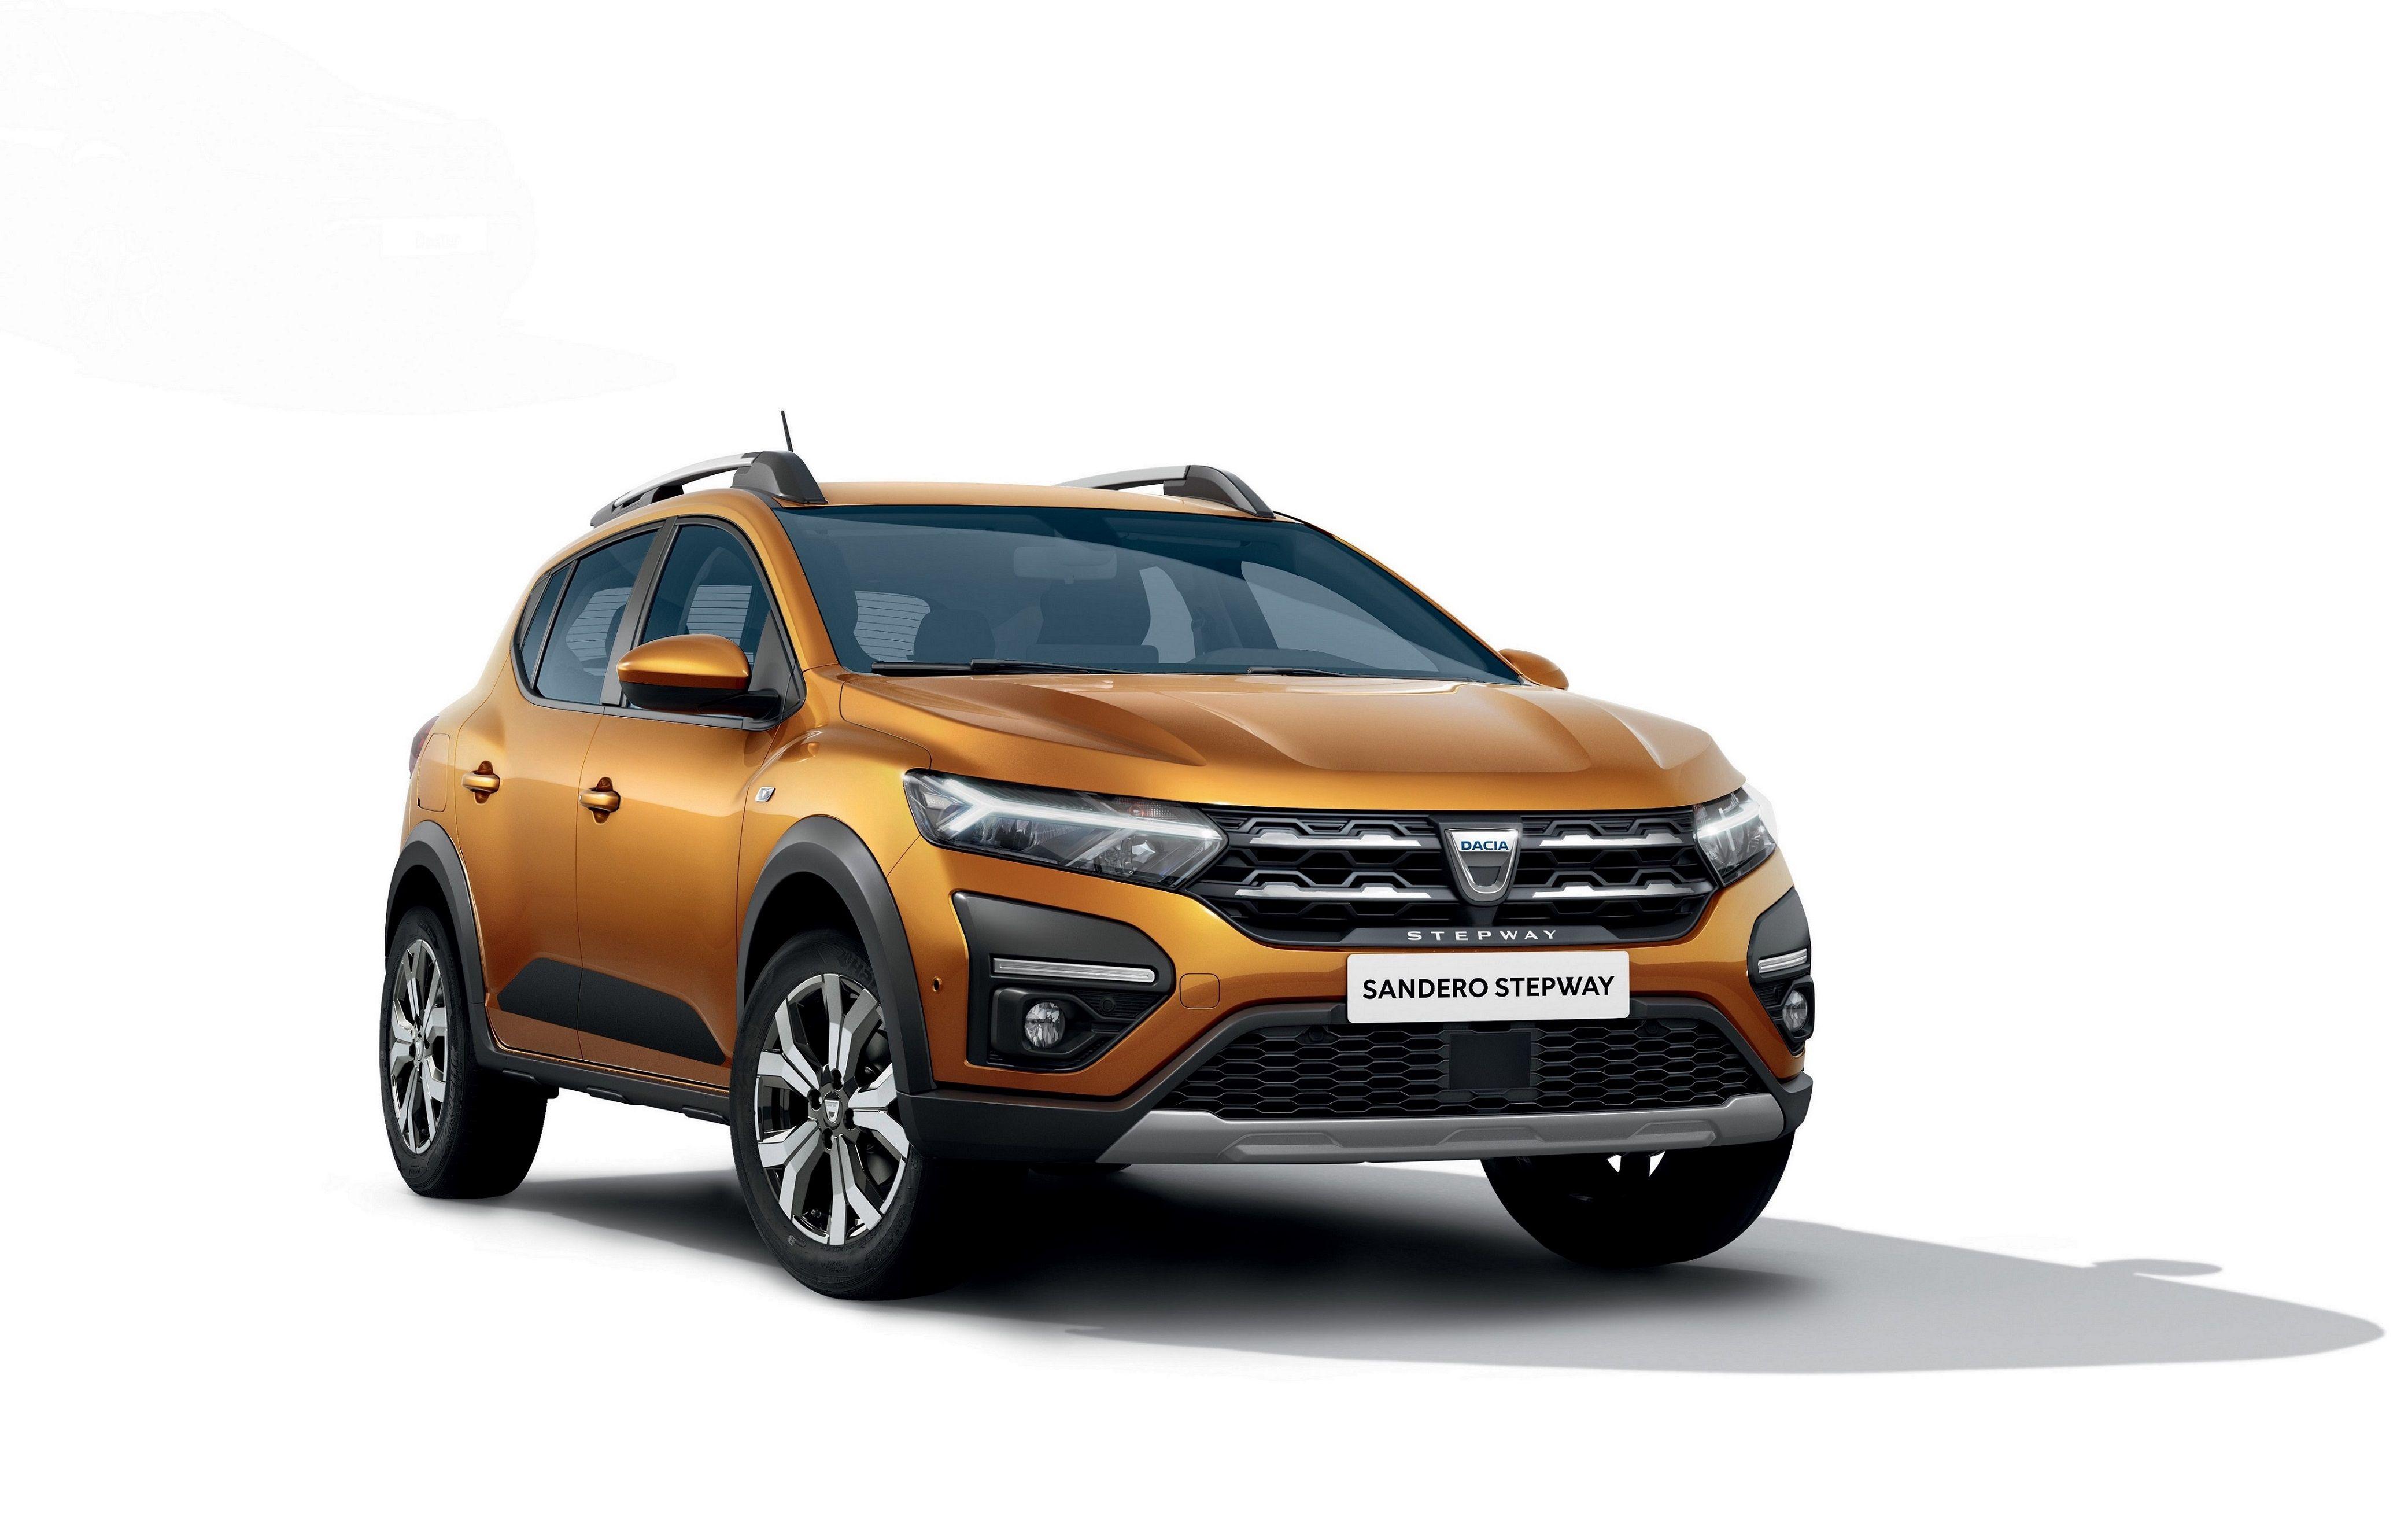 Giti Tire consigue un segundo acuerdo de montaje original con Grupo Renault en tres meses